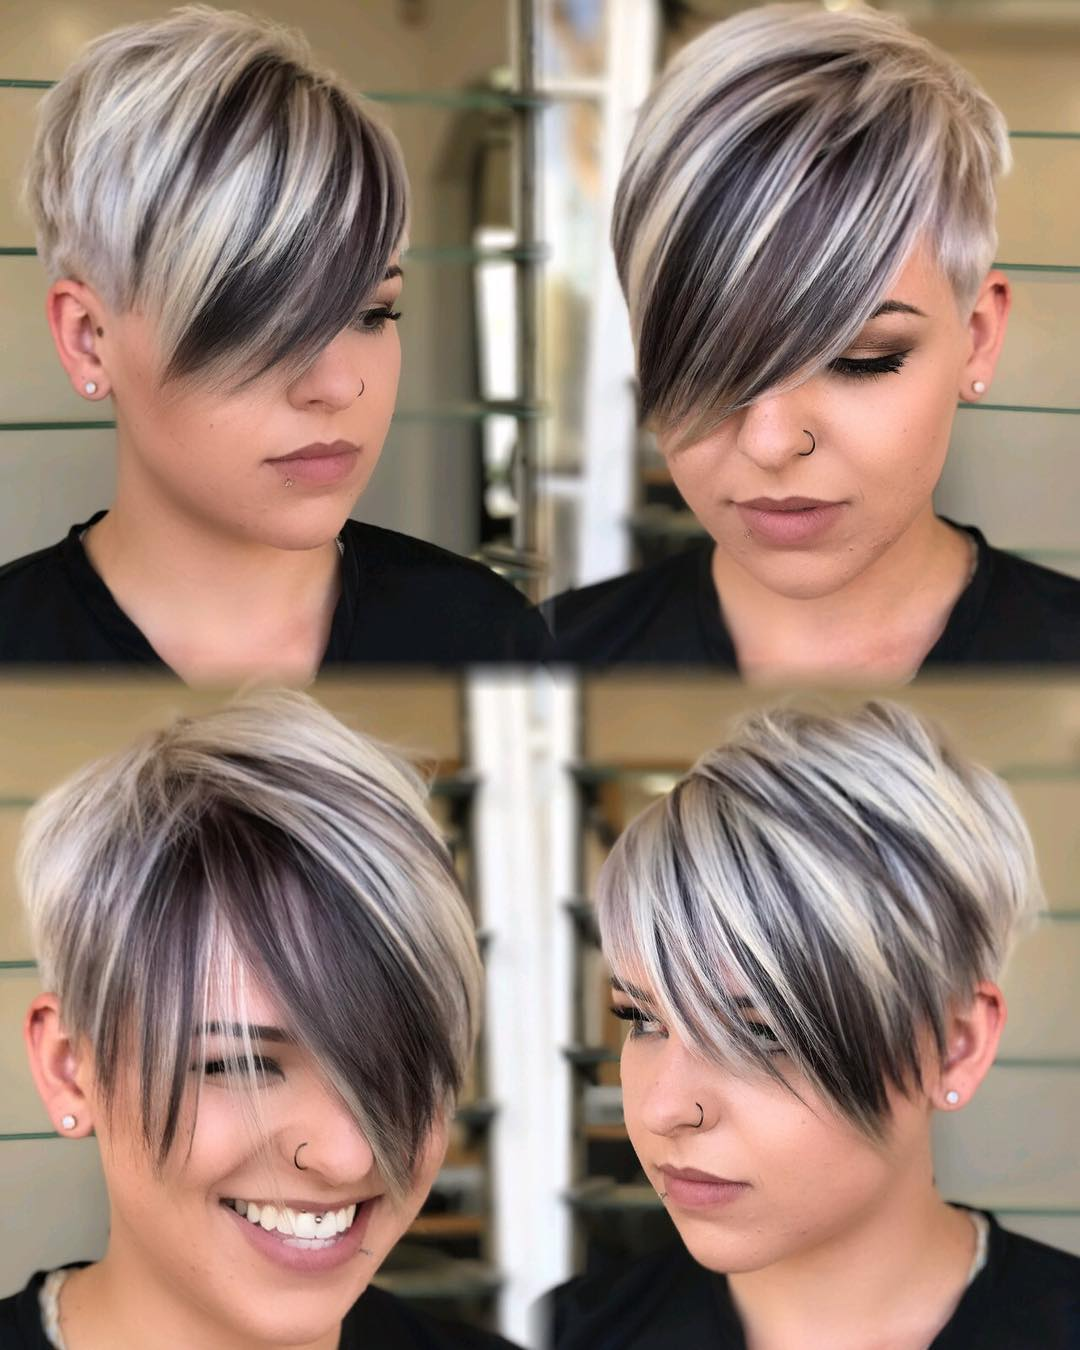 hairstyles to worthless tomentum moreover ringlike phizog to 50